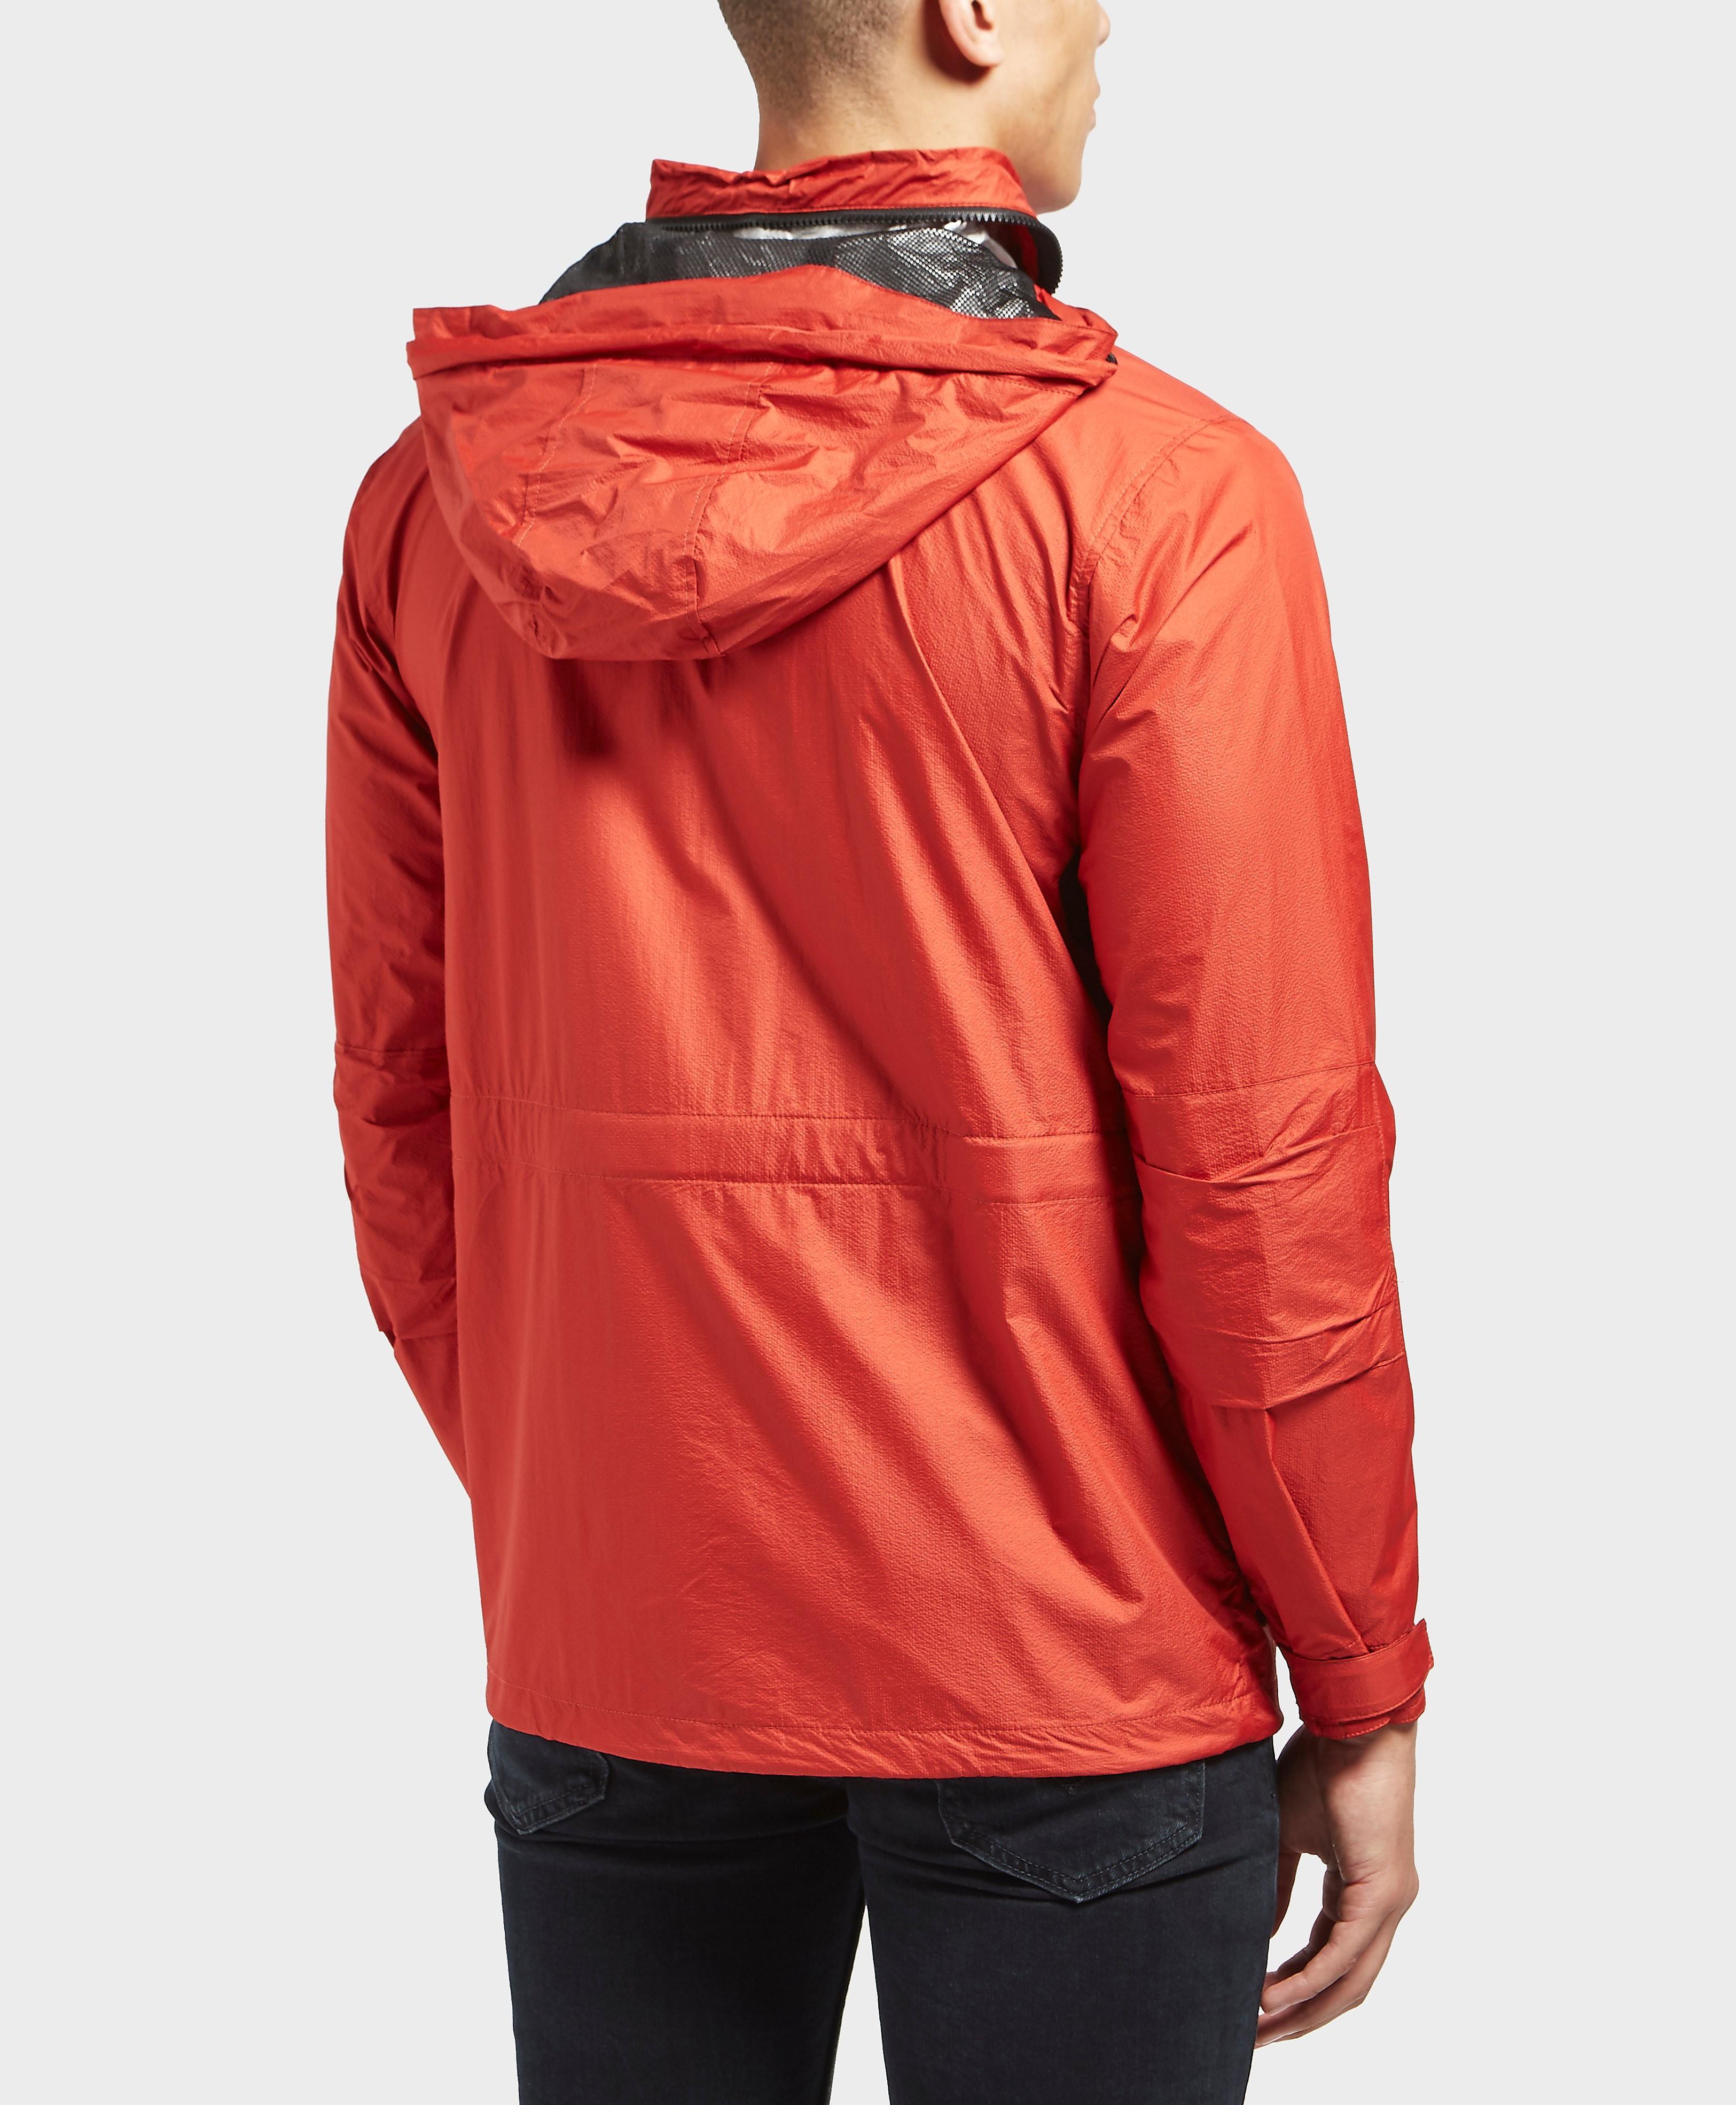 Marshall Artist Micro Ripstop Parachute Jacket